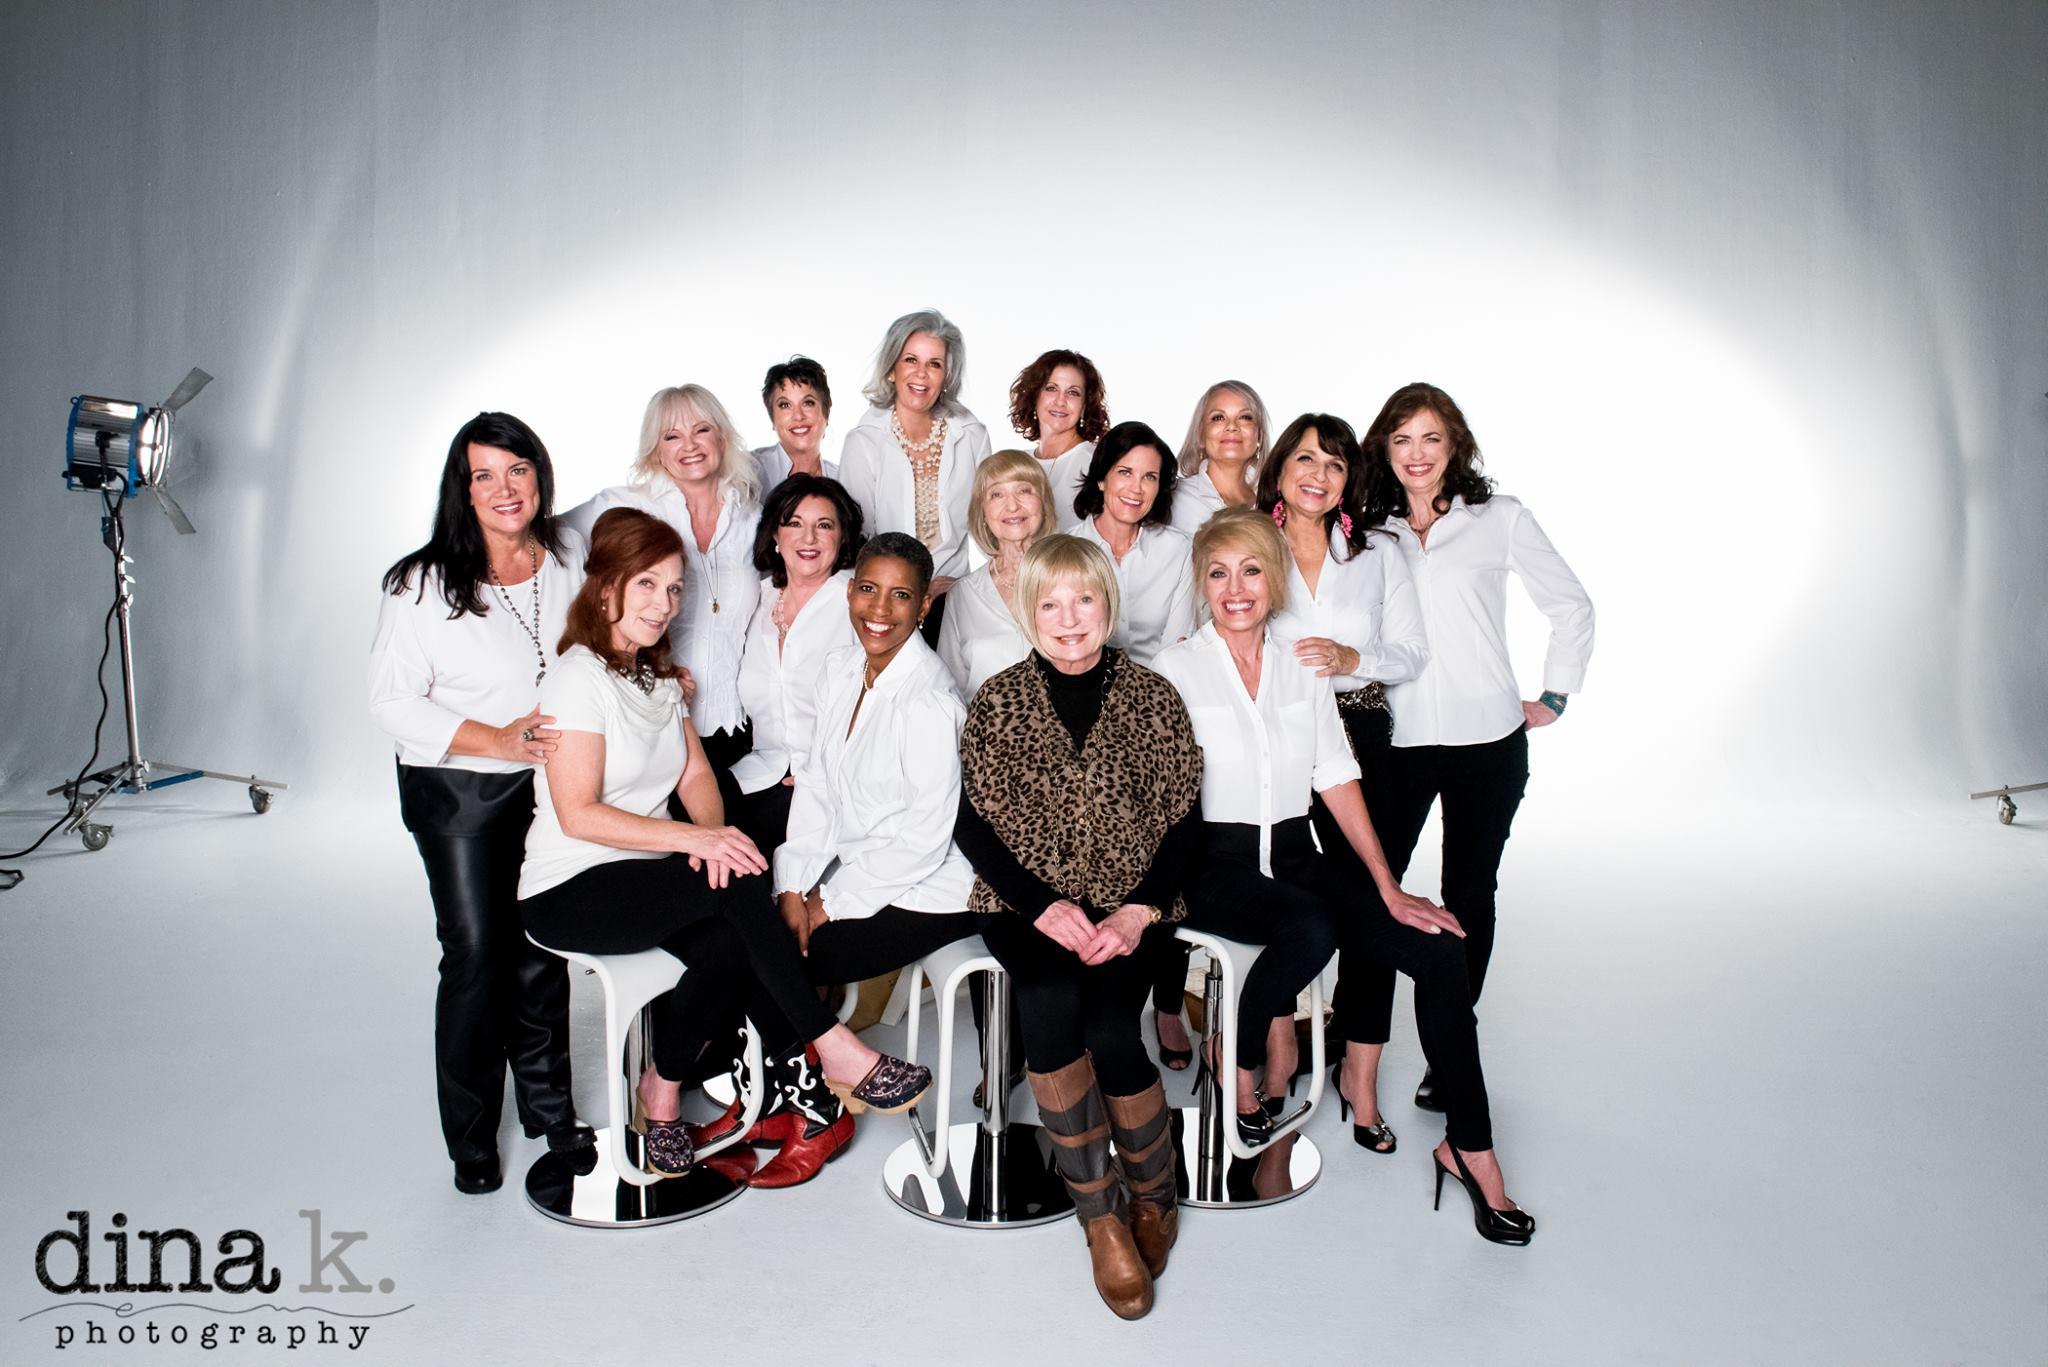 Women over 50 - Imagine Magazine